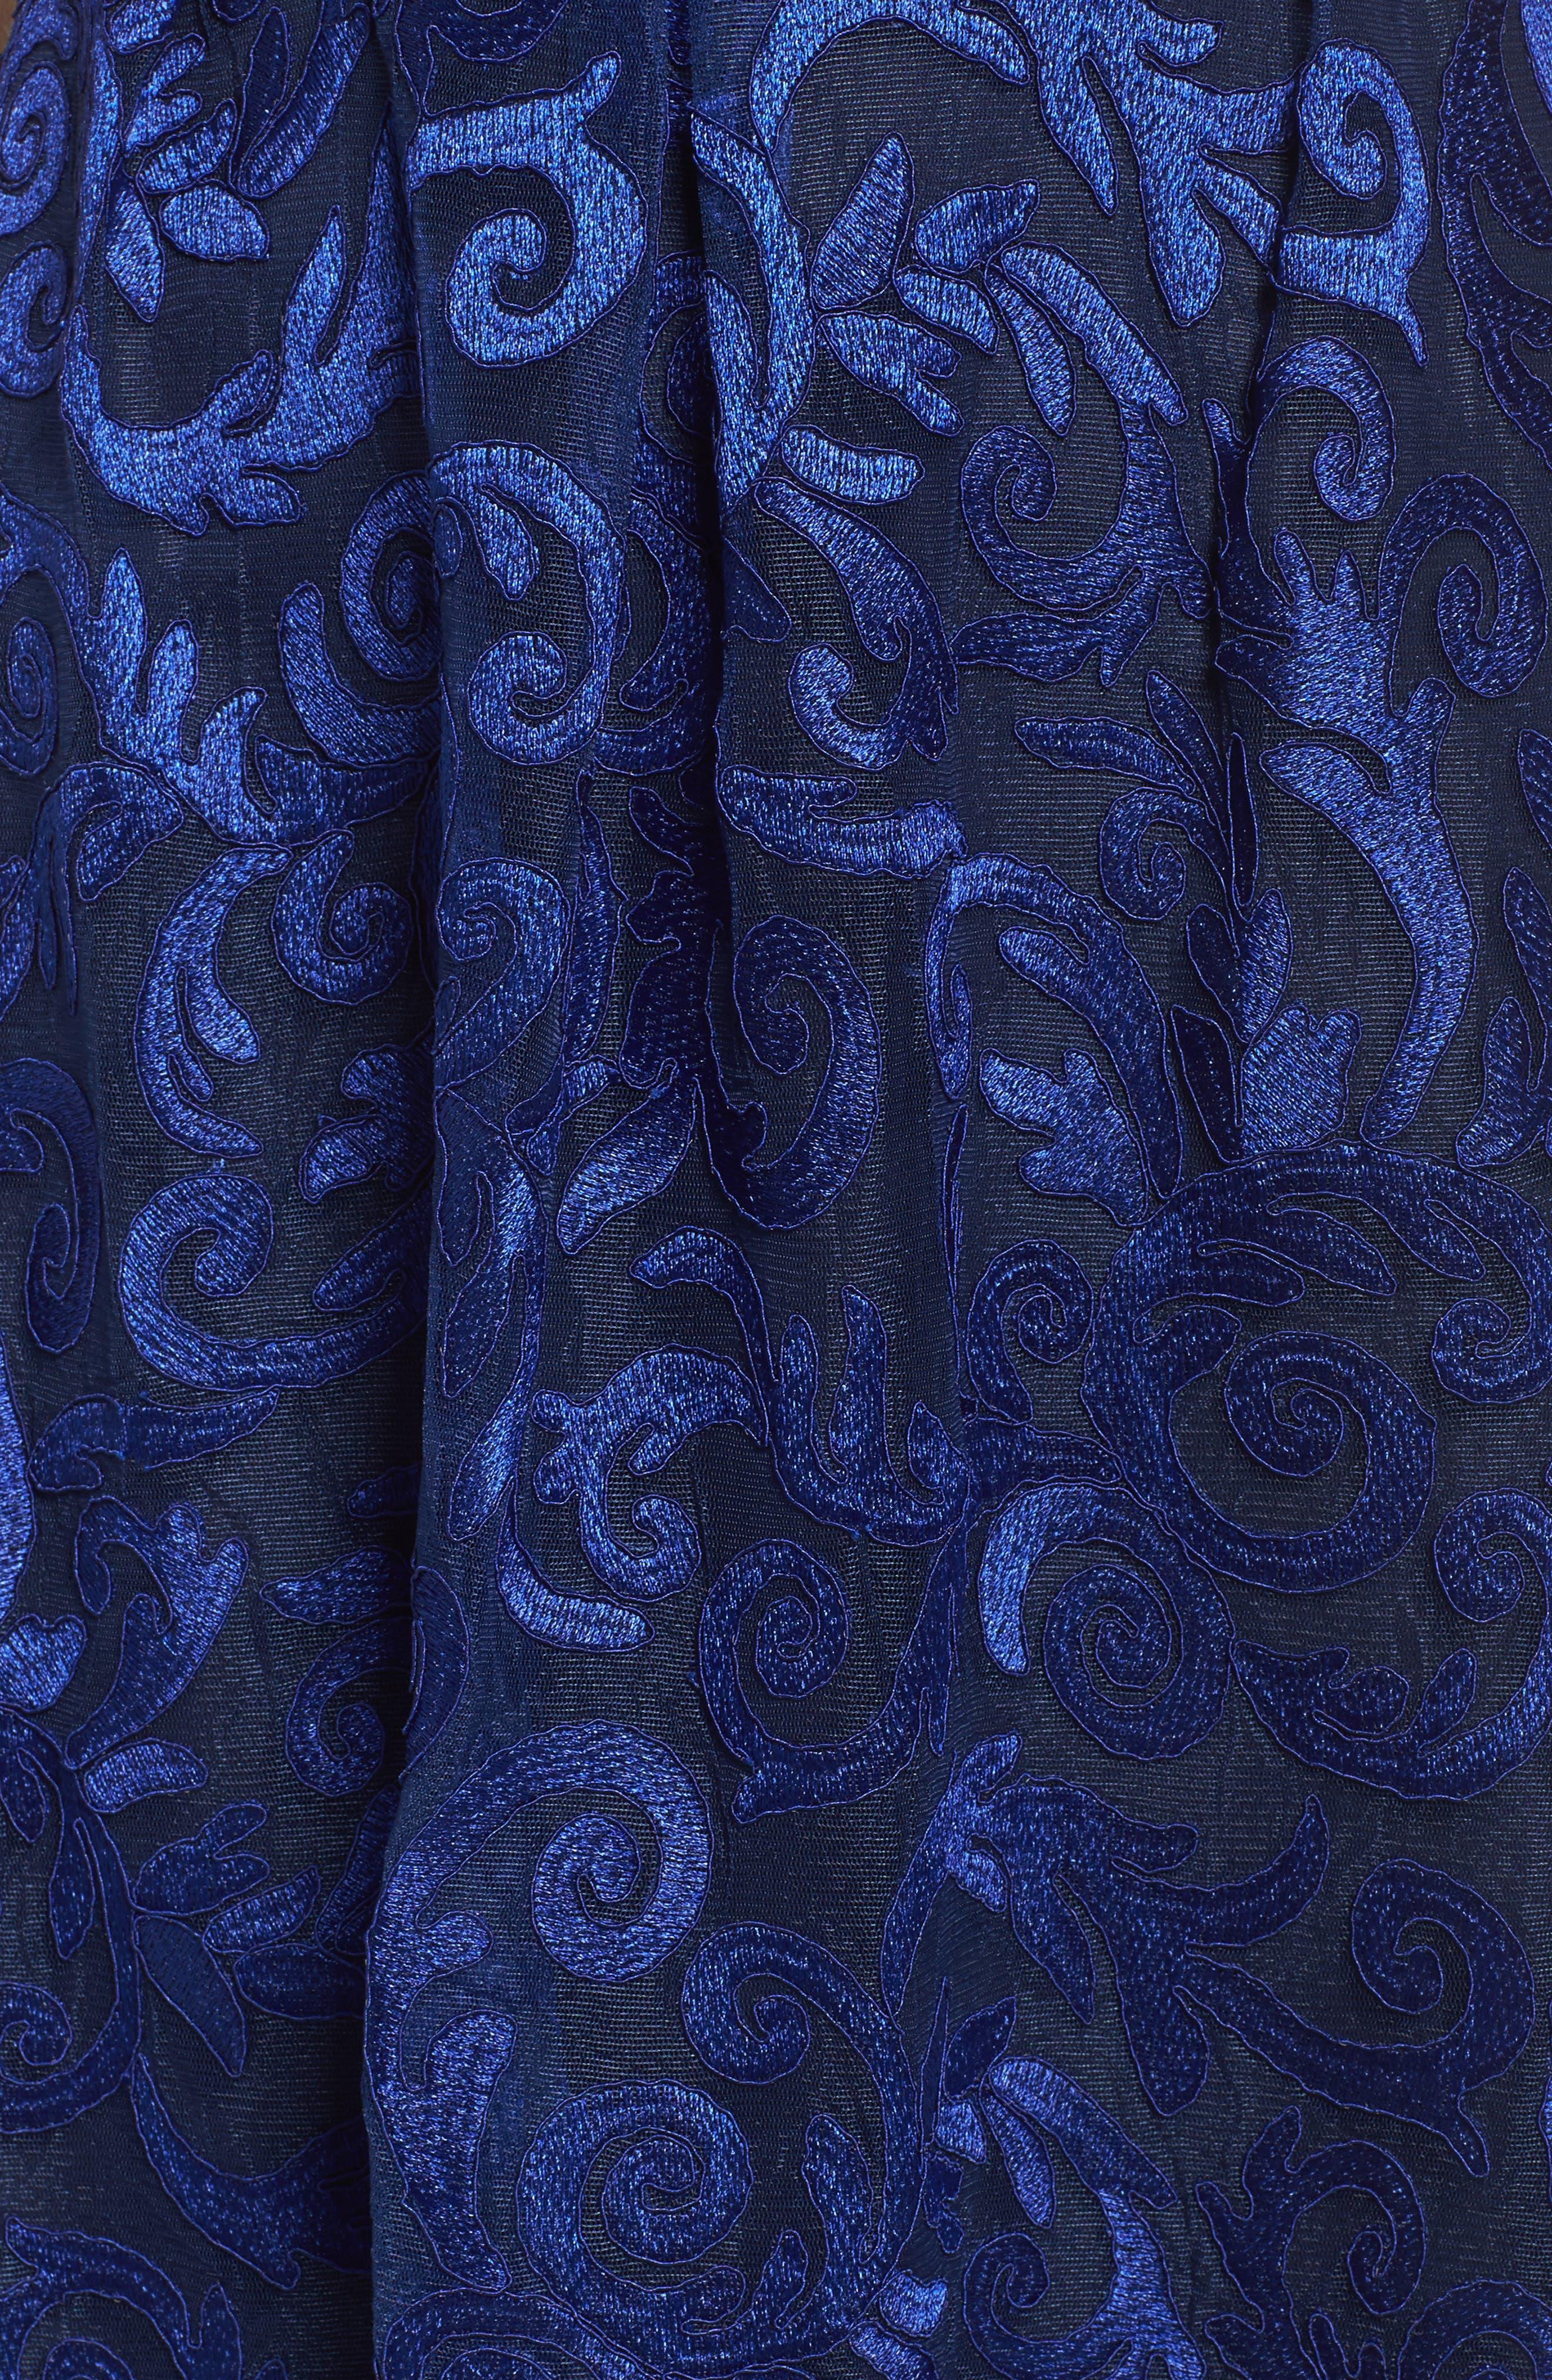 Floral Scroll Embroidered Cocktail Dress,                             Alternate thumbnail 5, color,                             Cobalt